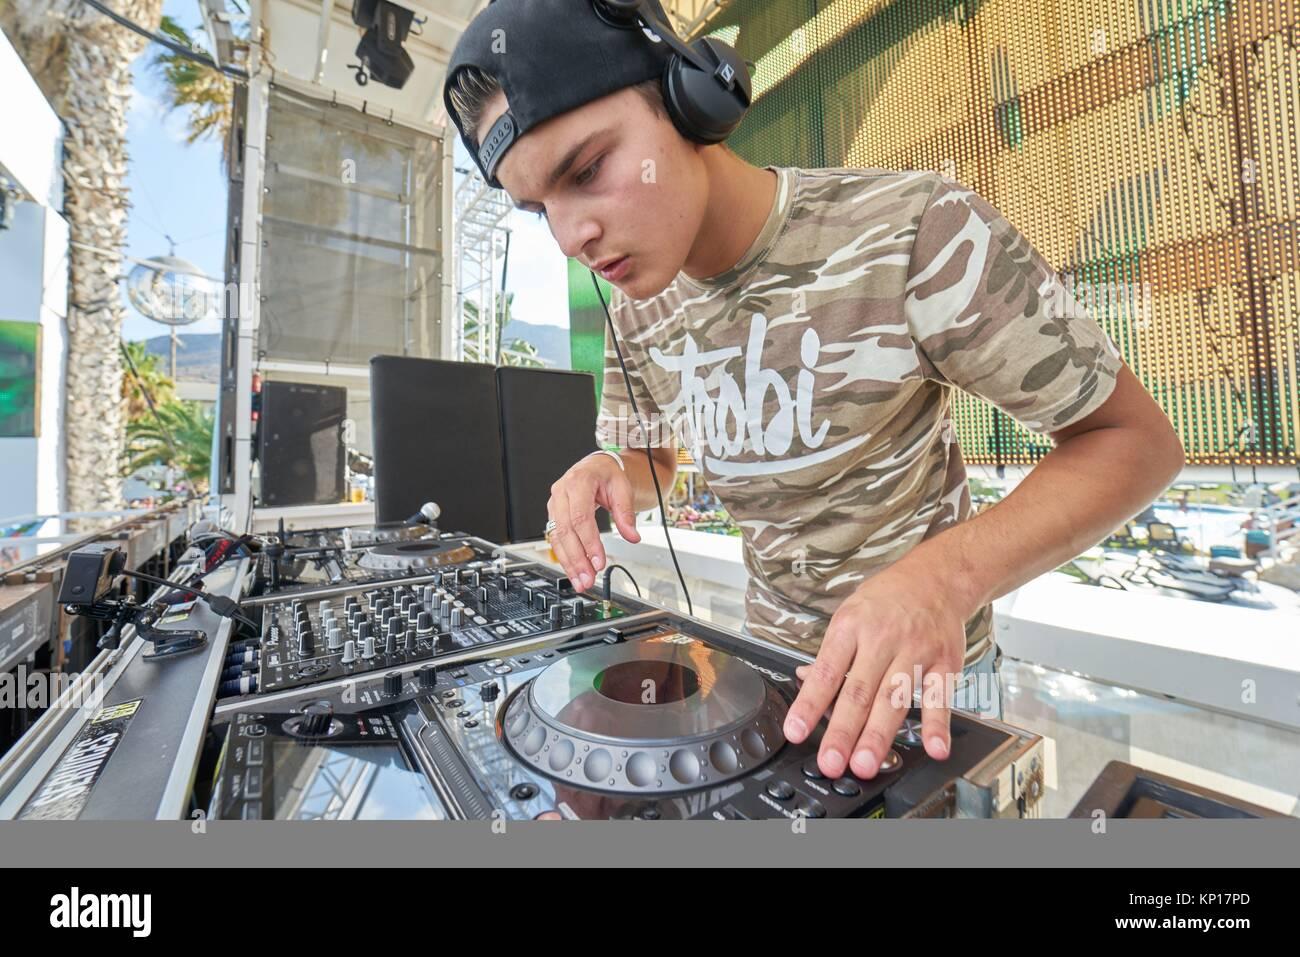 DJ Trobi spielen bei Music festival Starbeach am 18. August 2017, in Hersonissos, Kreta, Griechenland Stockbild